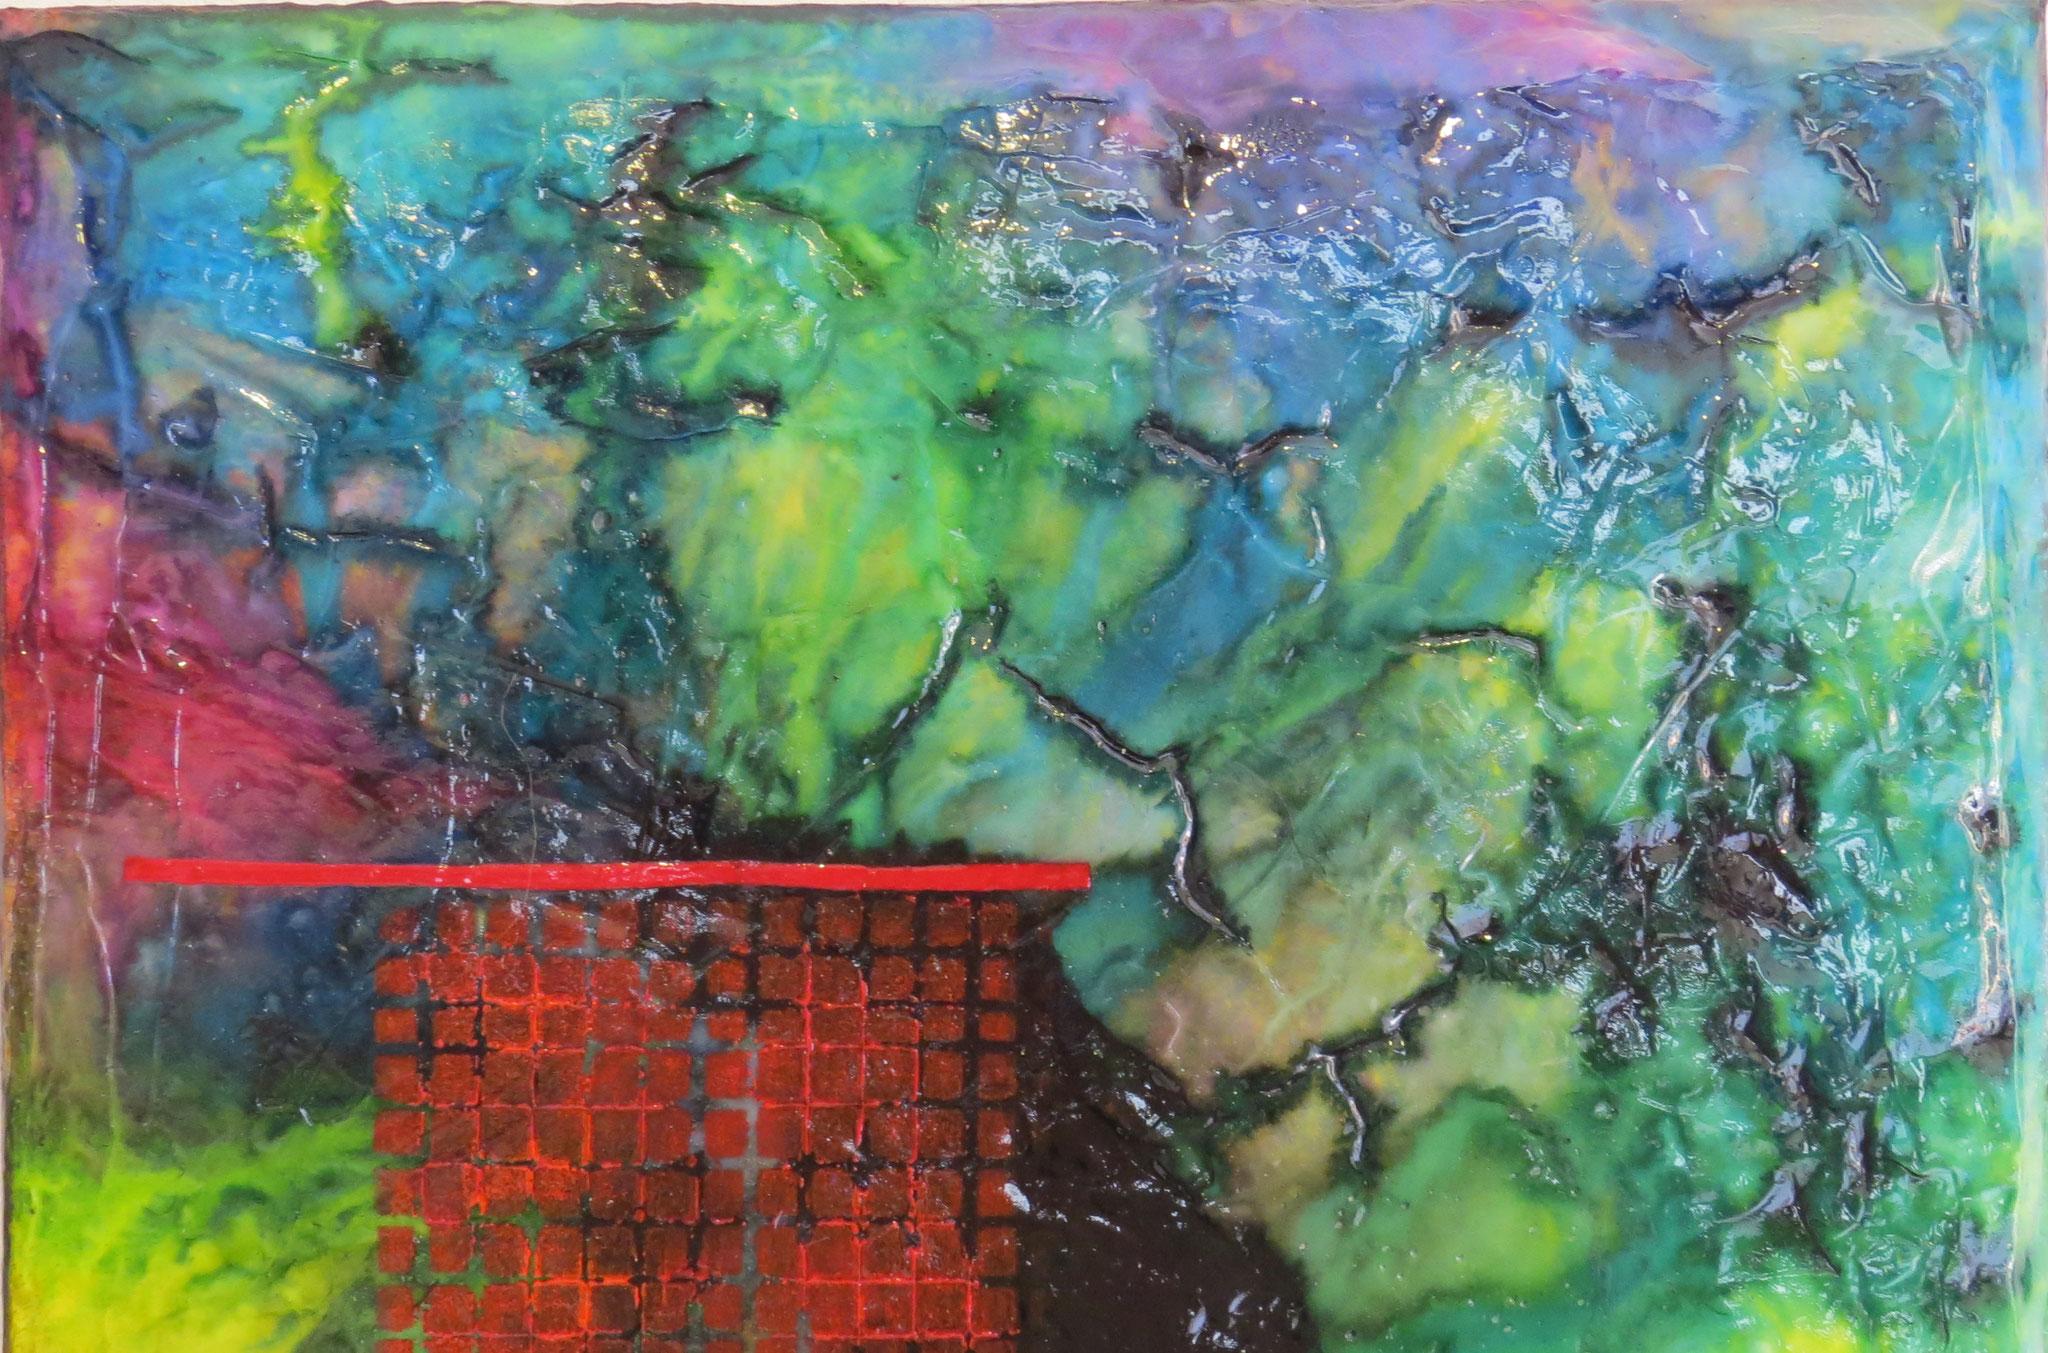 nimbes - zoom1 - DALUZ GALEGO - peinture abstraite